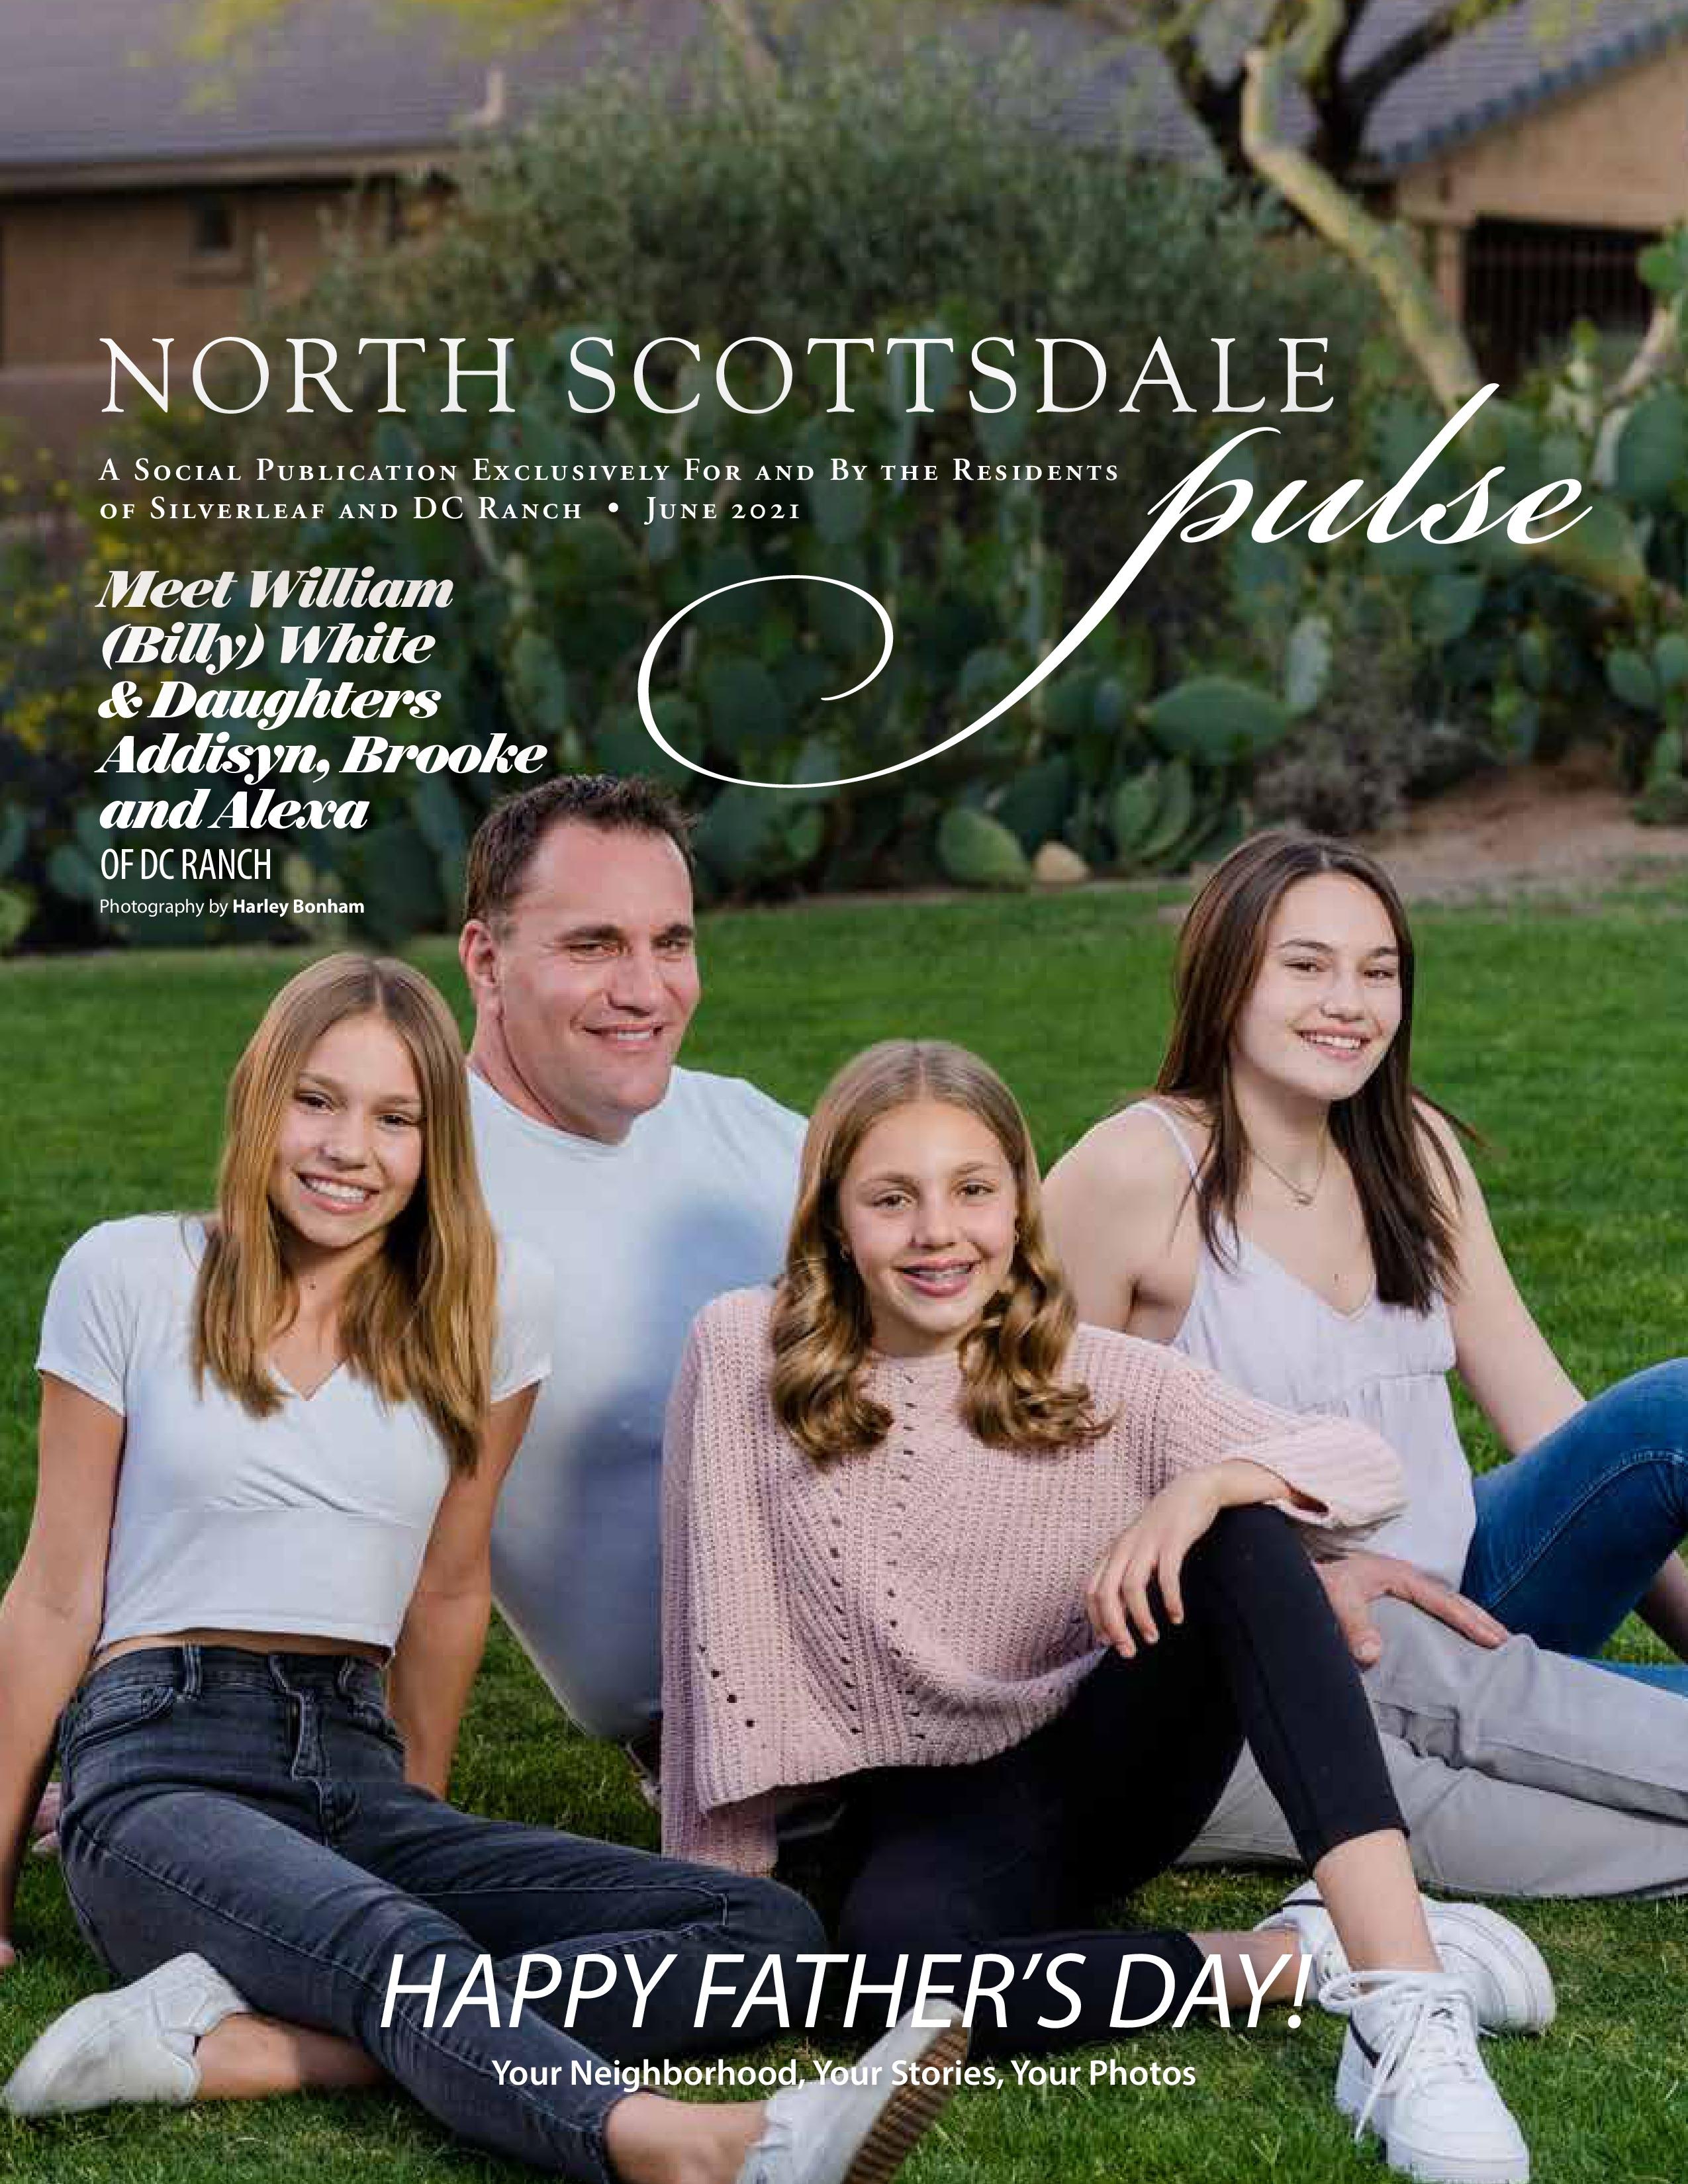 North Scottsdale Pulse 2021-06-01